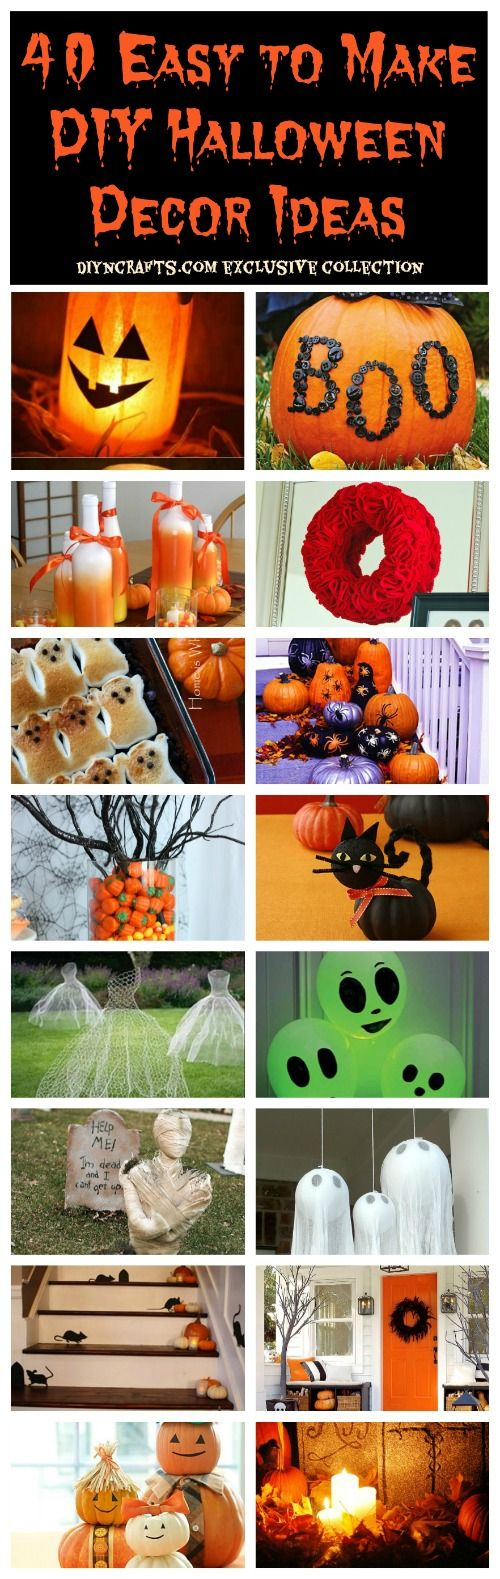 40 Easy to Make DIY Halloween Decor Ideas and Linked Tutorials